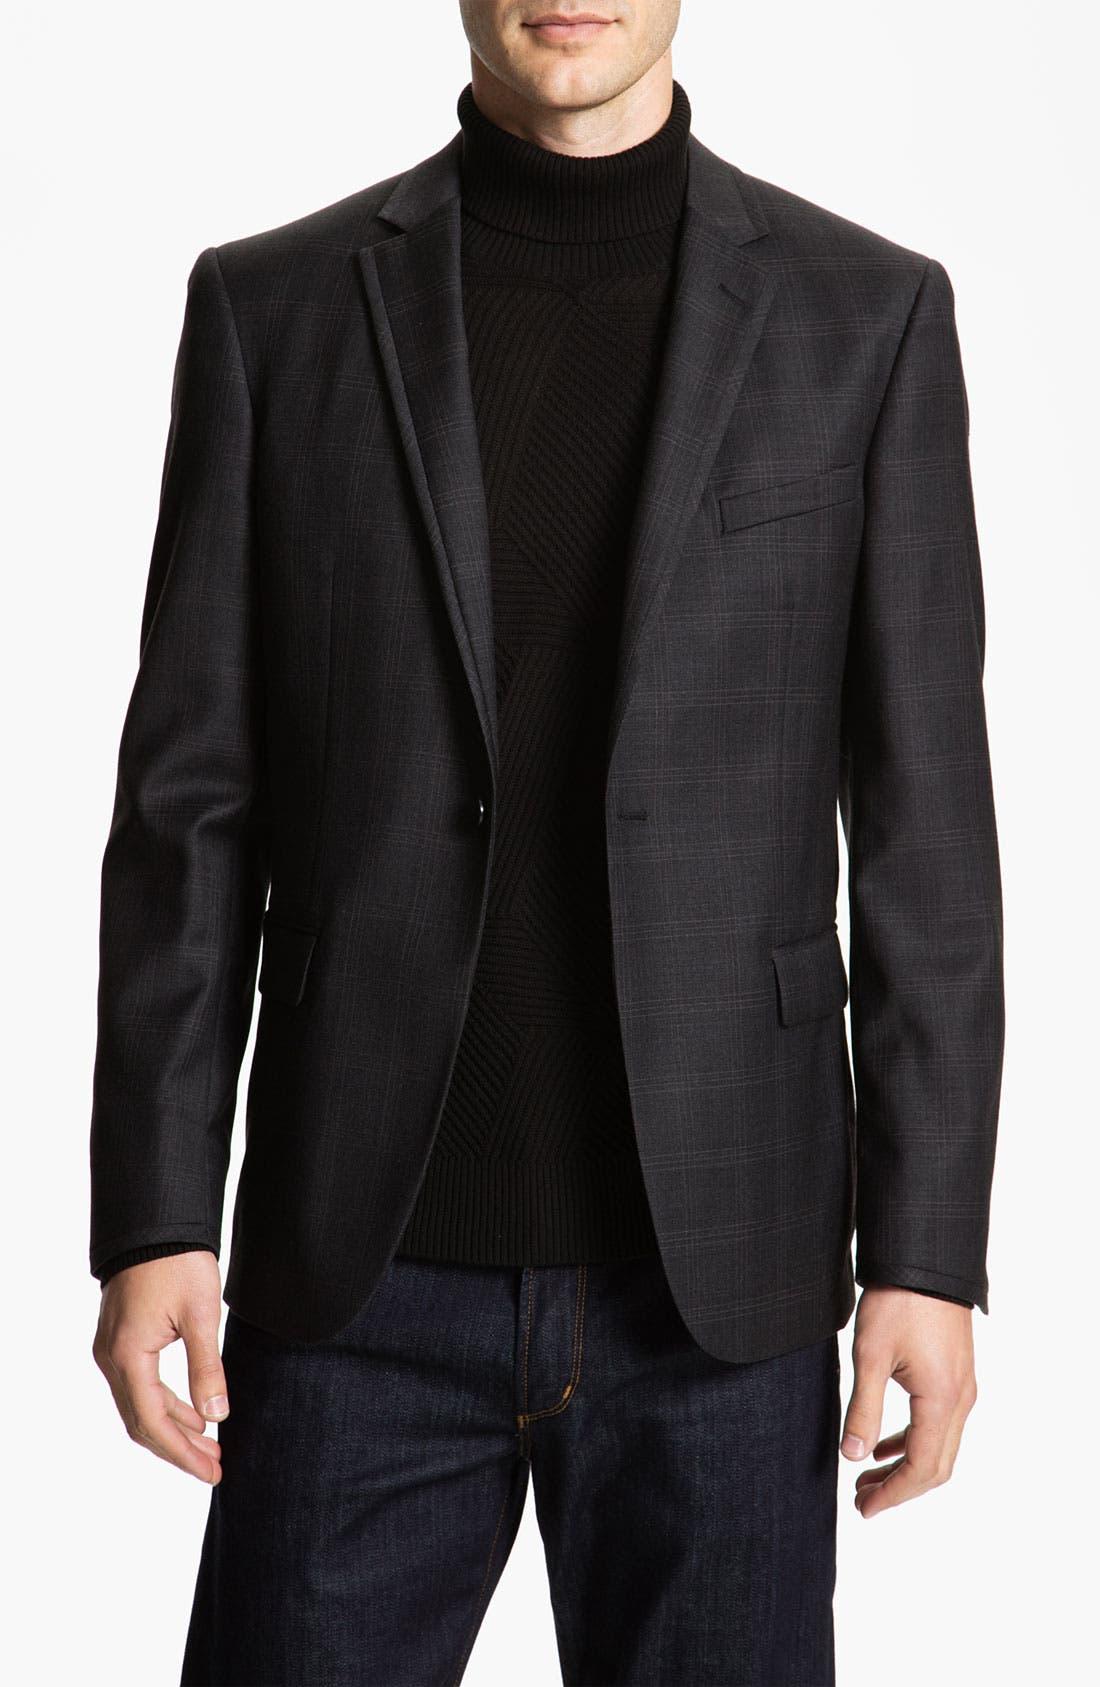 Alternate Image 1 Selected - Calibrate Plaid Wool Sportcoat